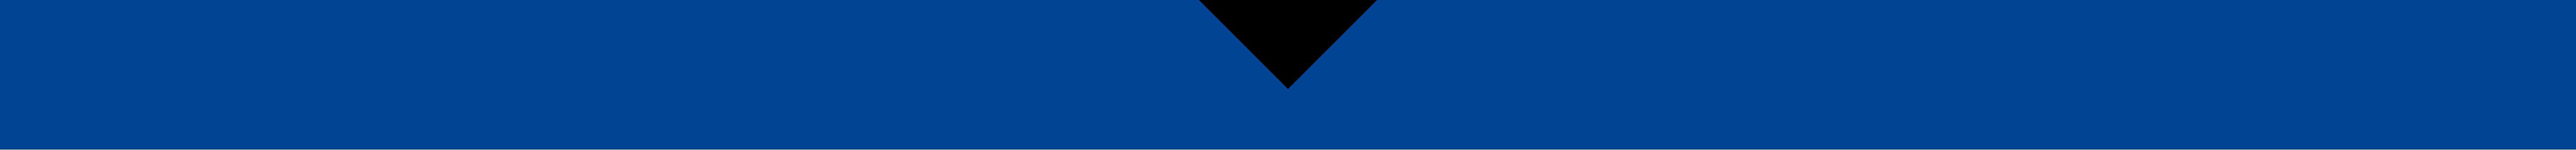 Abtrennung_Blau